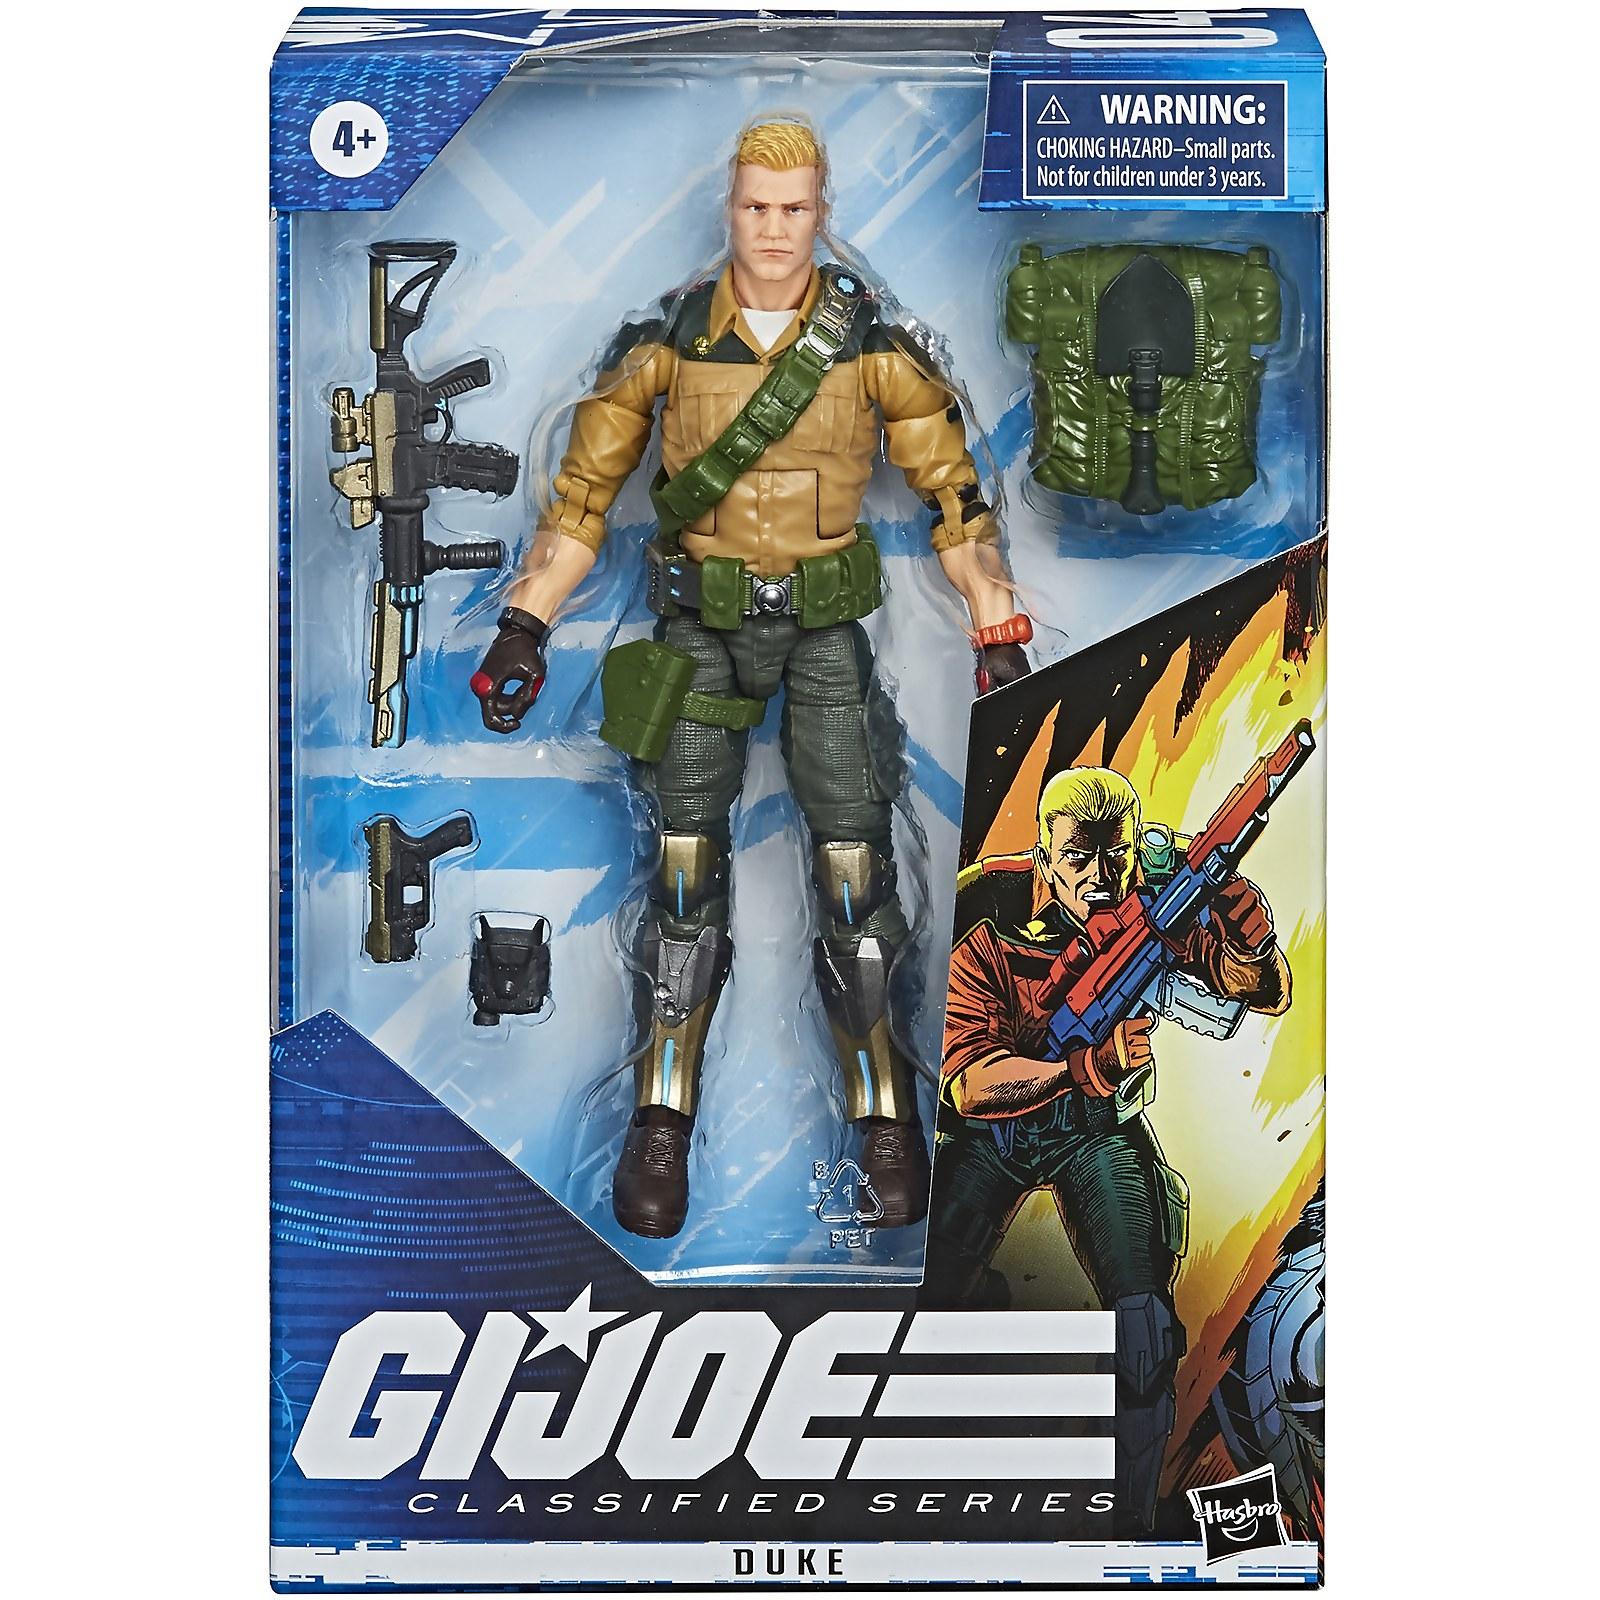 Image of Hasbro G.I. Joe Classified Series Duke 6-Inch Scale Action Figure 04